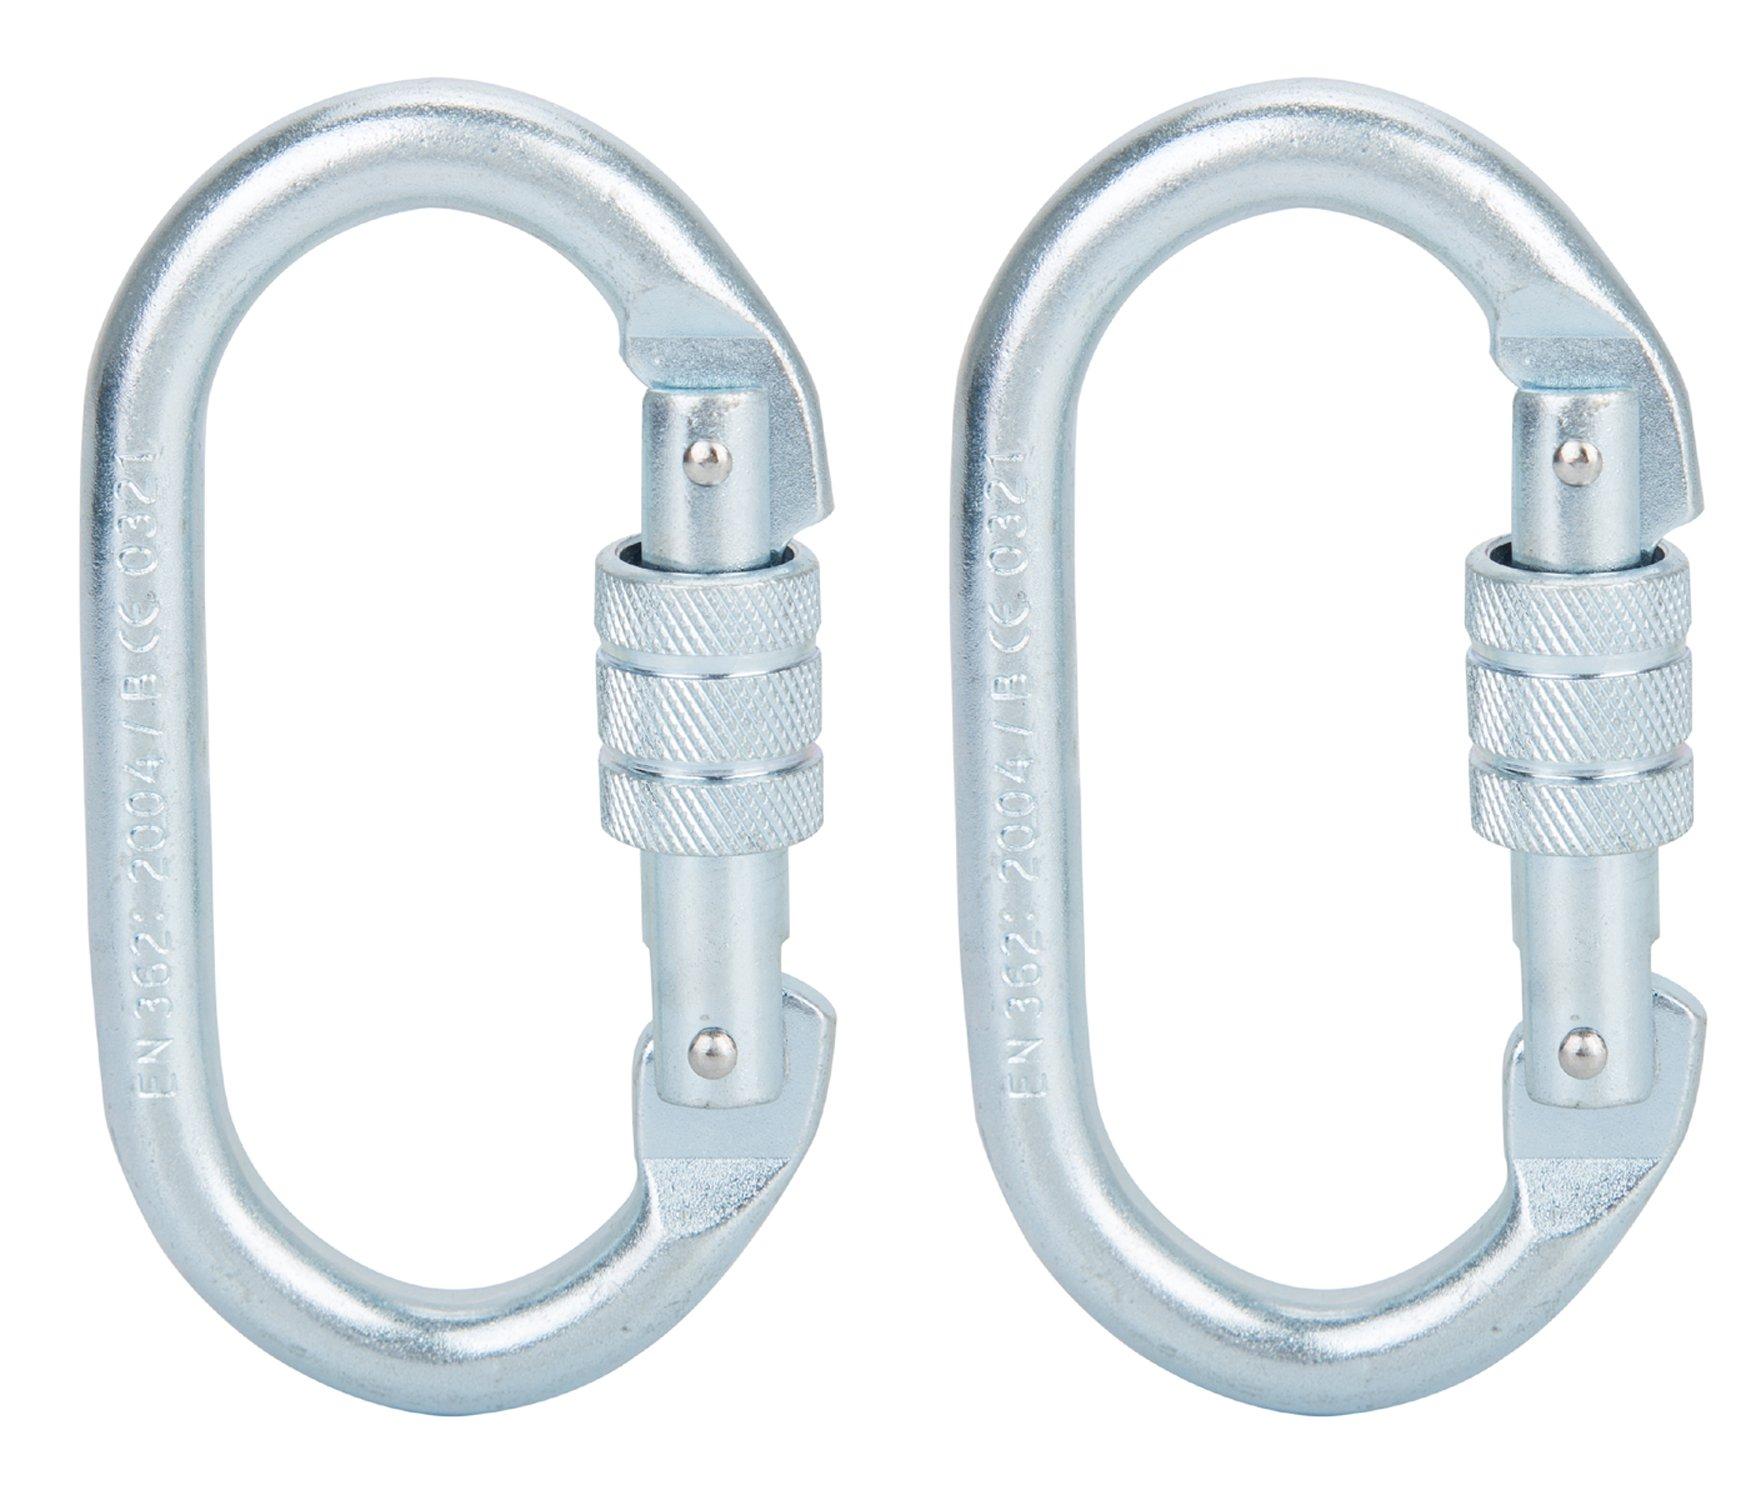 Faswin 2 Pack O-Shaped Rocklock Climbing Carabiner - Screwgate Carabiner For Climbing Hiking Yoga Hammock and Exploring Rappelling (25KN=5600 lb)